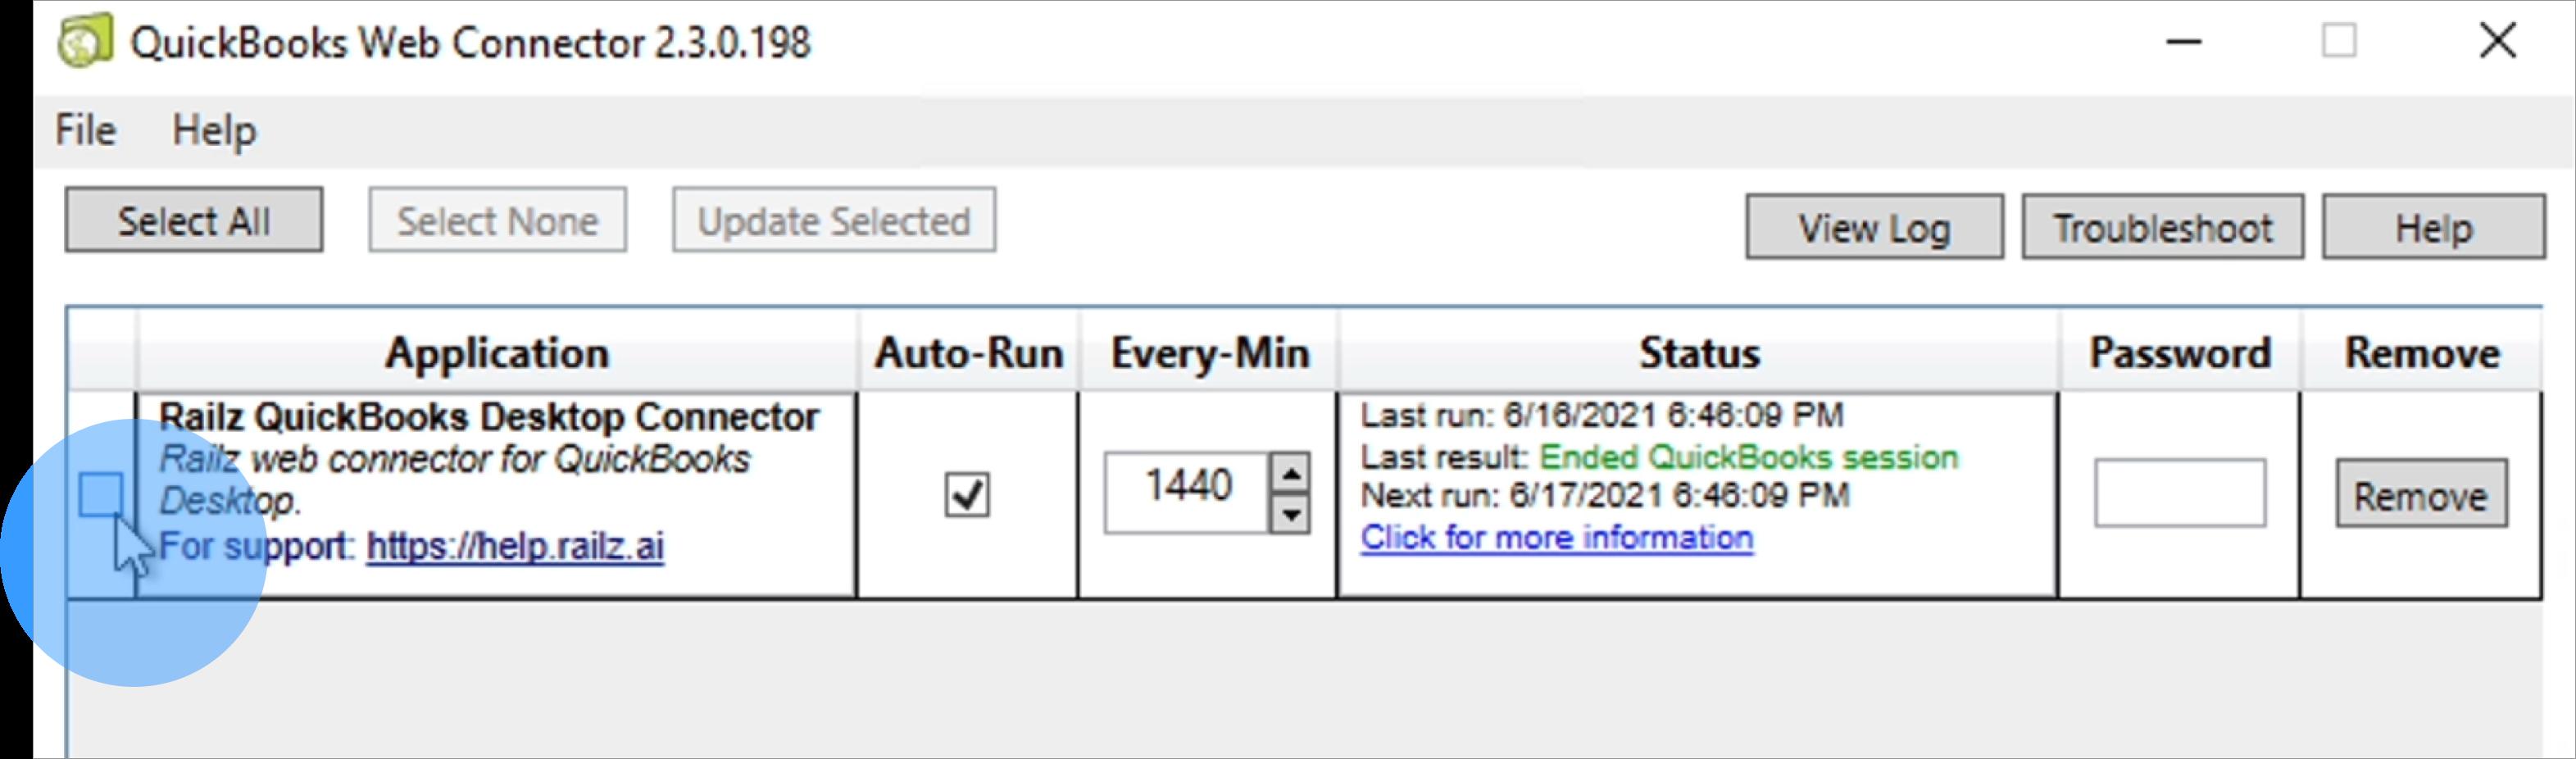 Railz Connect - QuickBooks Desktop Password prompt. Click to Expand.